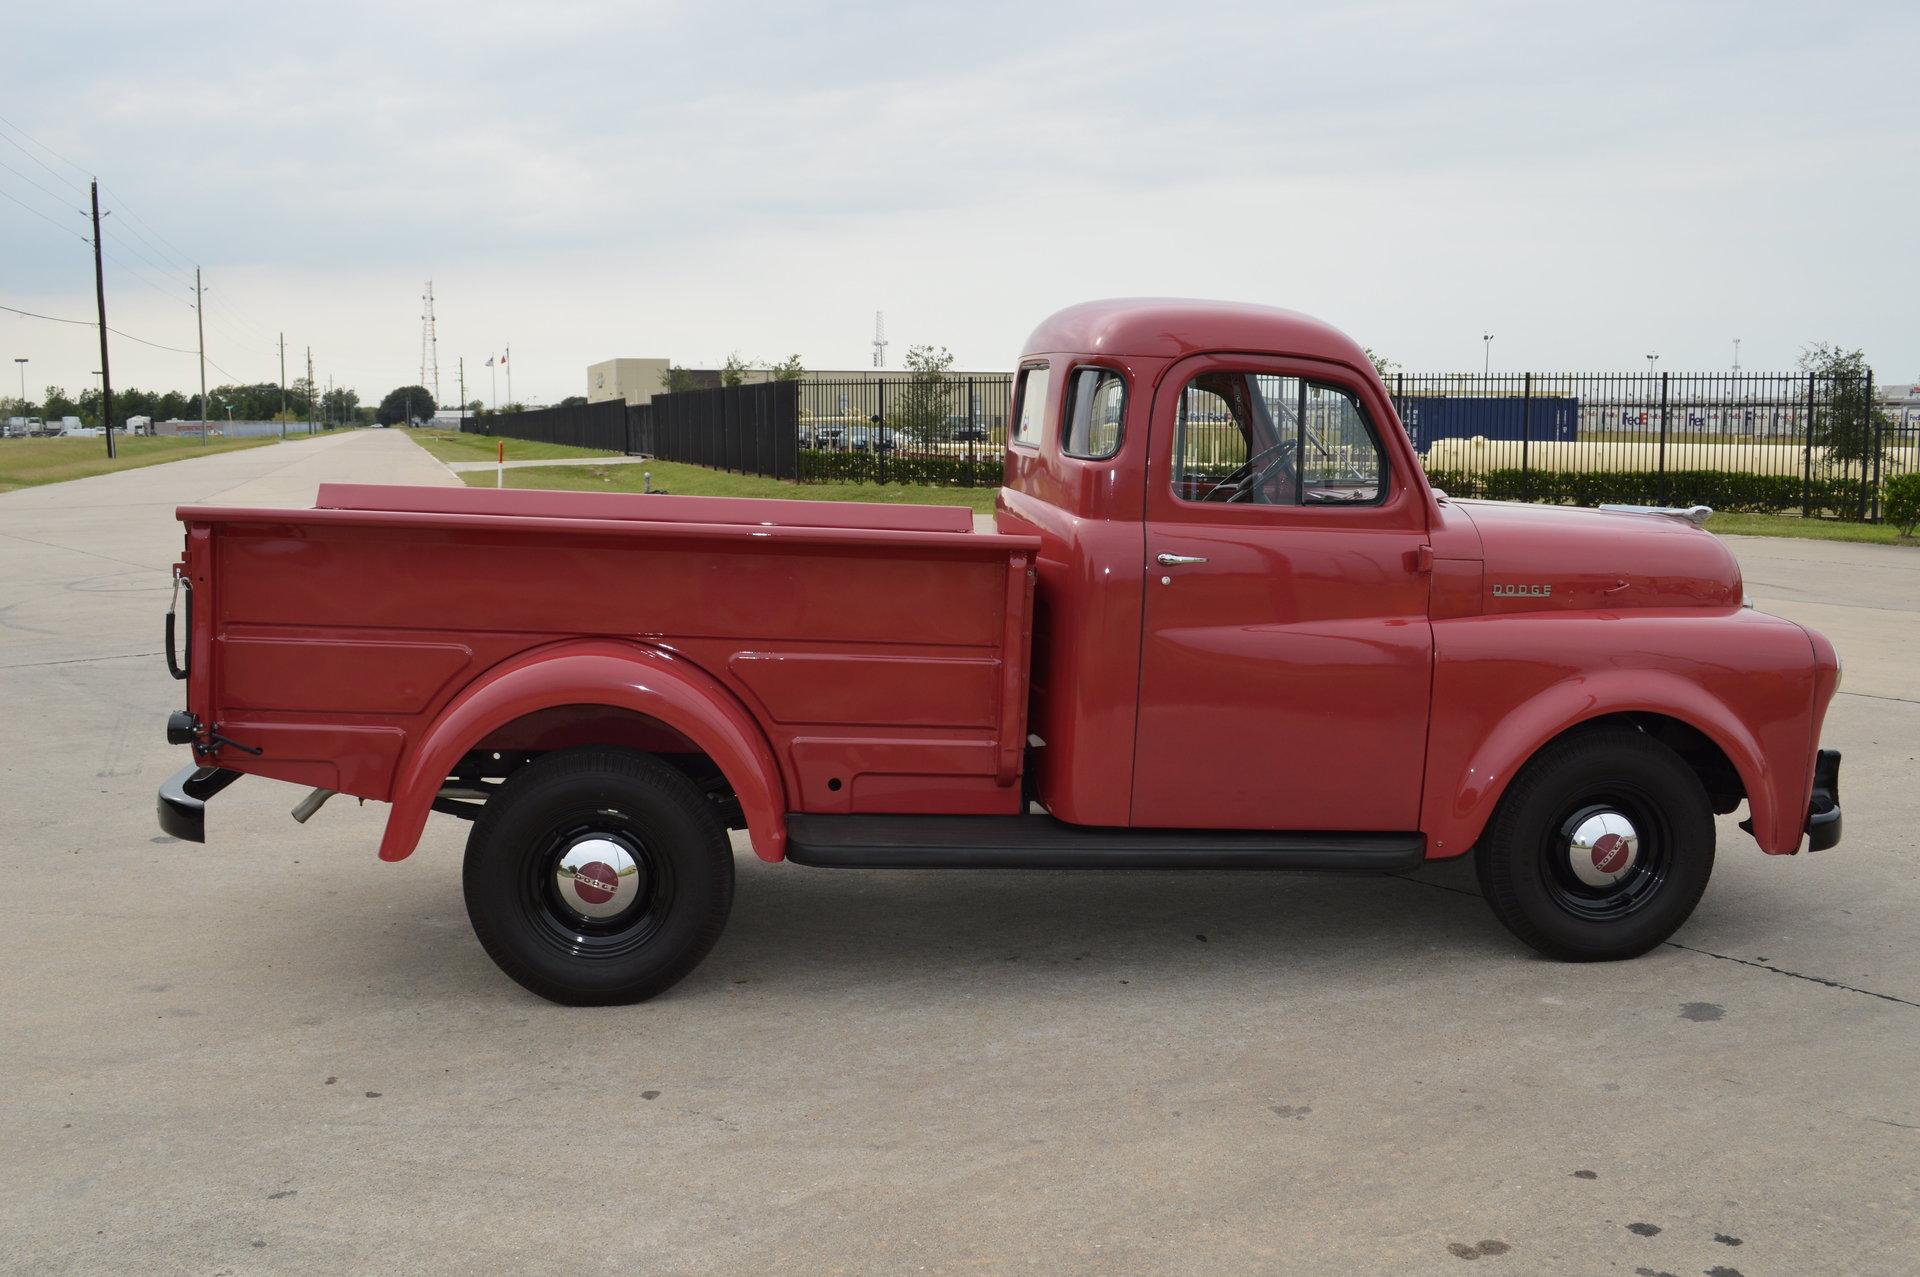 1949 Dodge 1 2 Ton B1 C 116 Pilot House Pickup For Sale 68032 Mcg Truck Seat